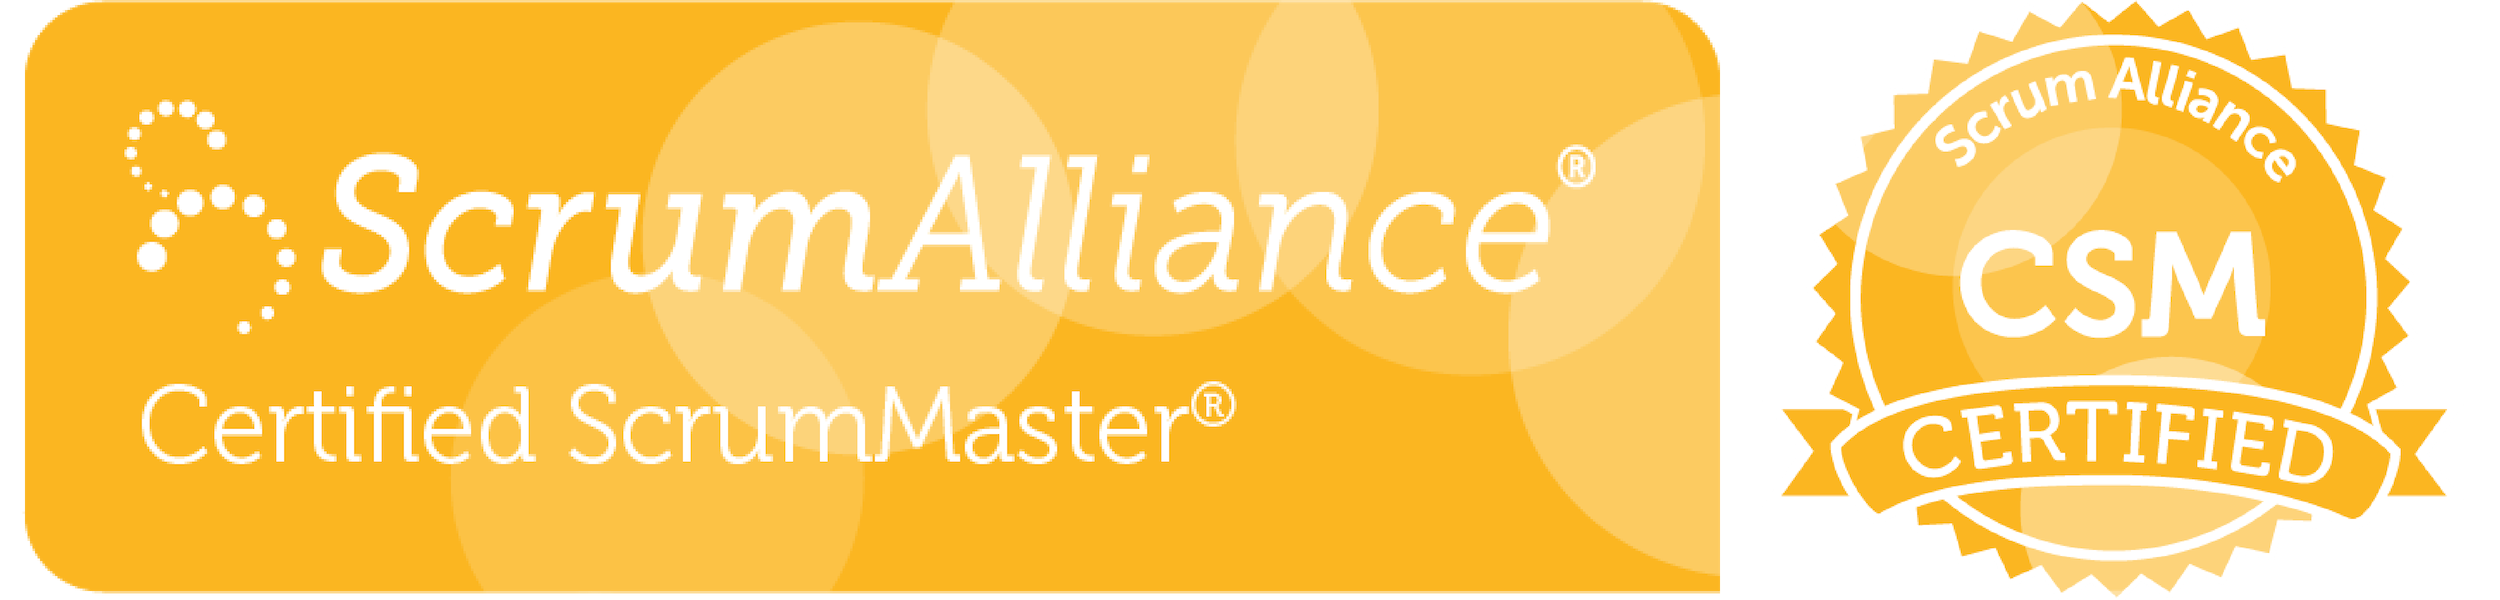 Scrum Alliance Certified Scrum Master.png